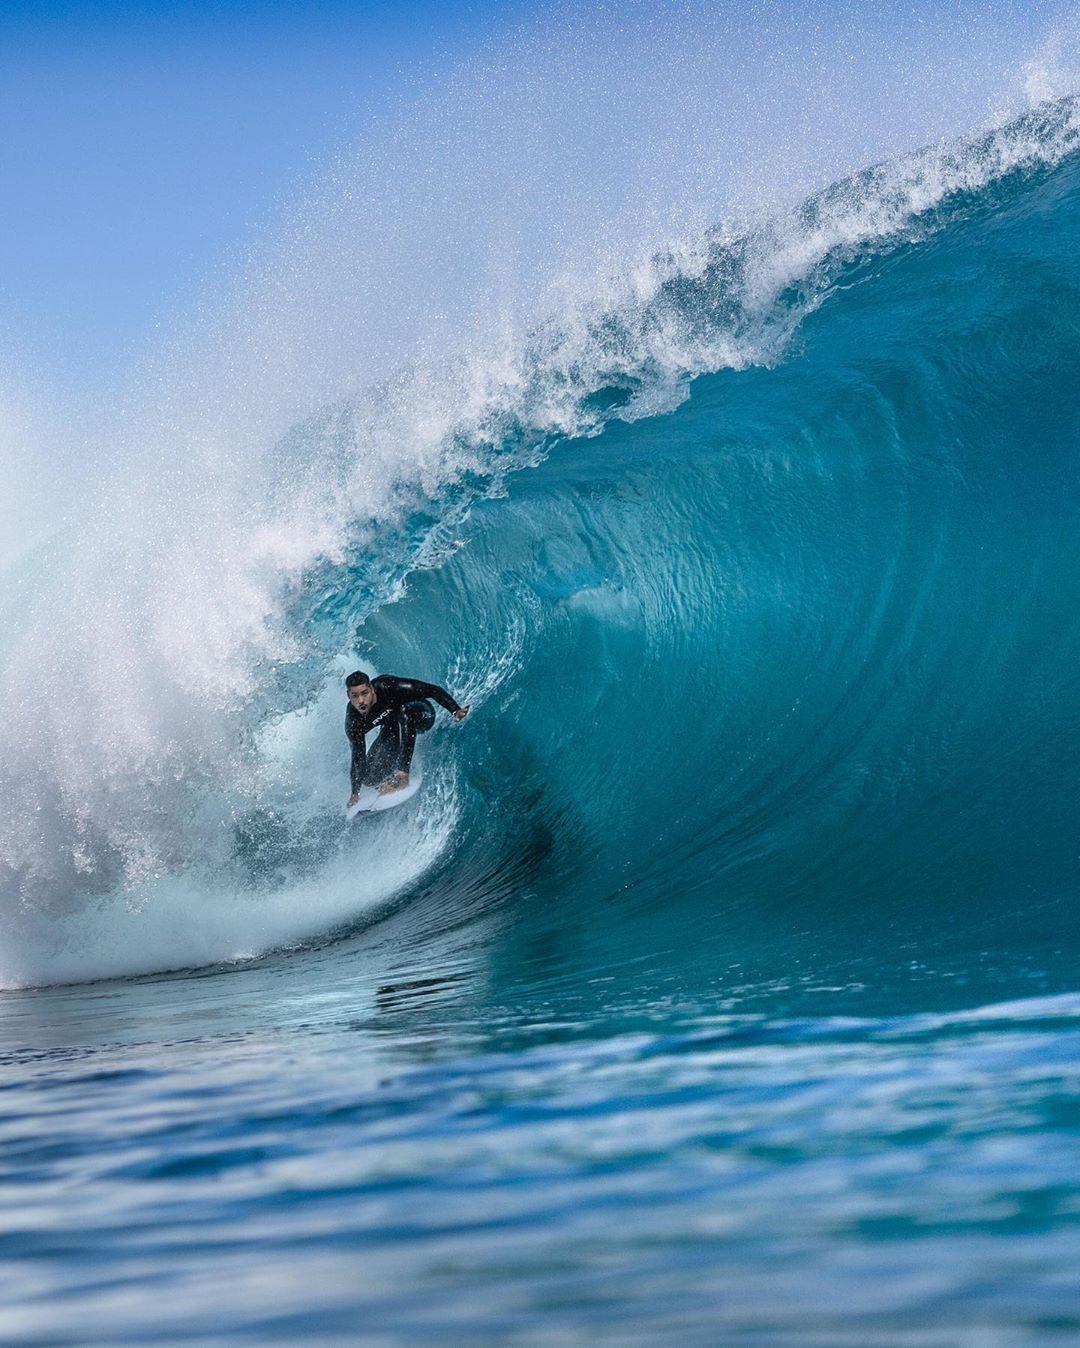 Interview with Kyle Bowman West Australian Photographer